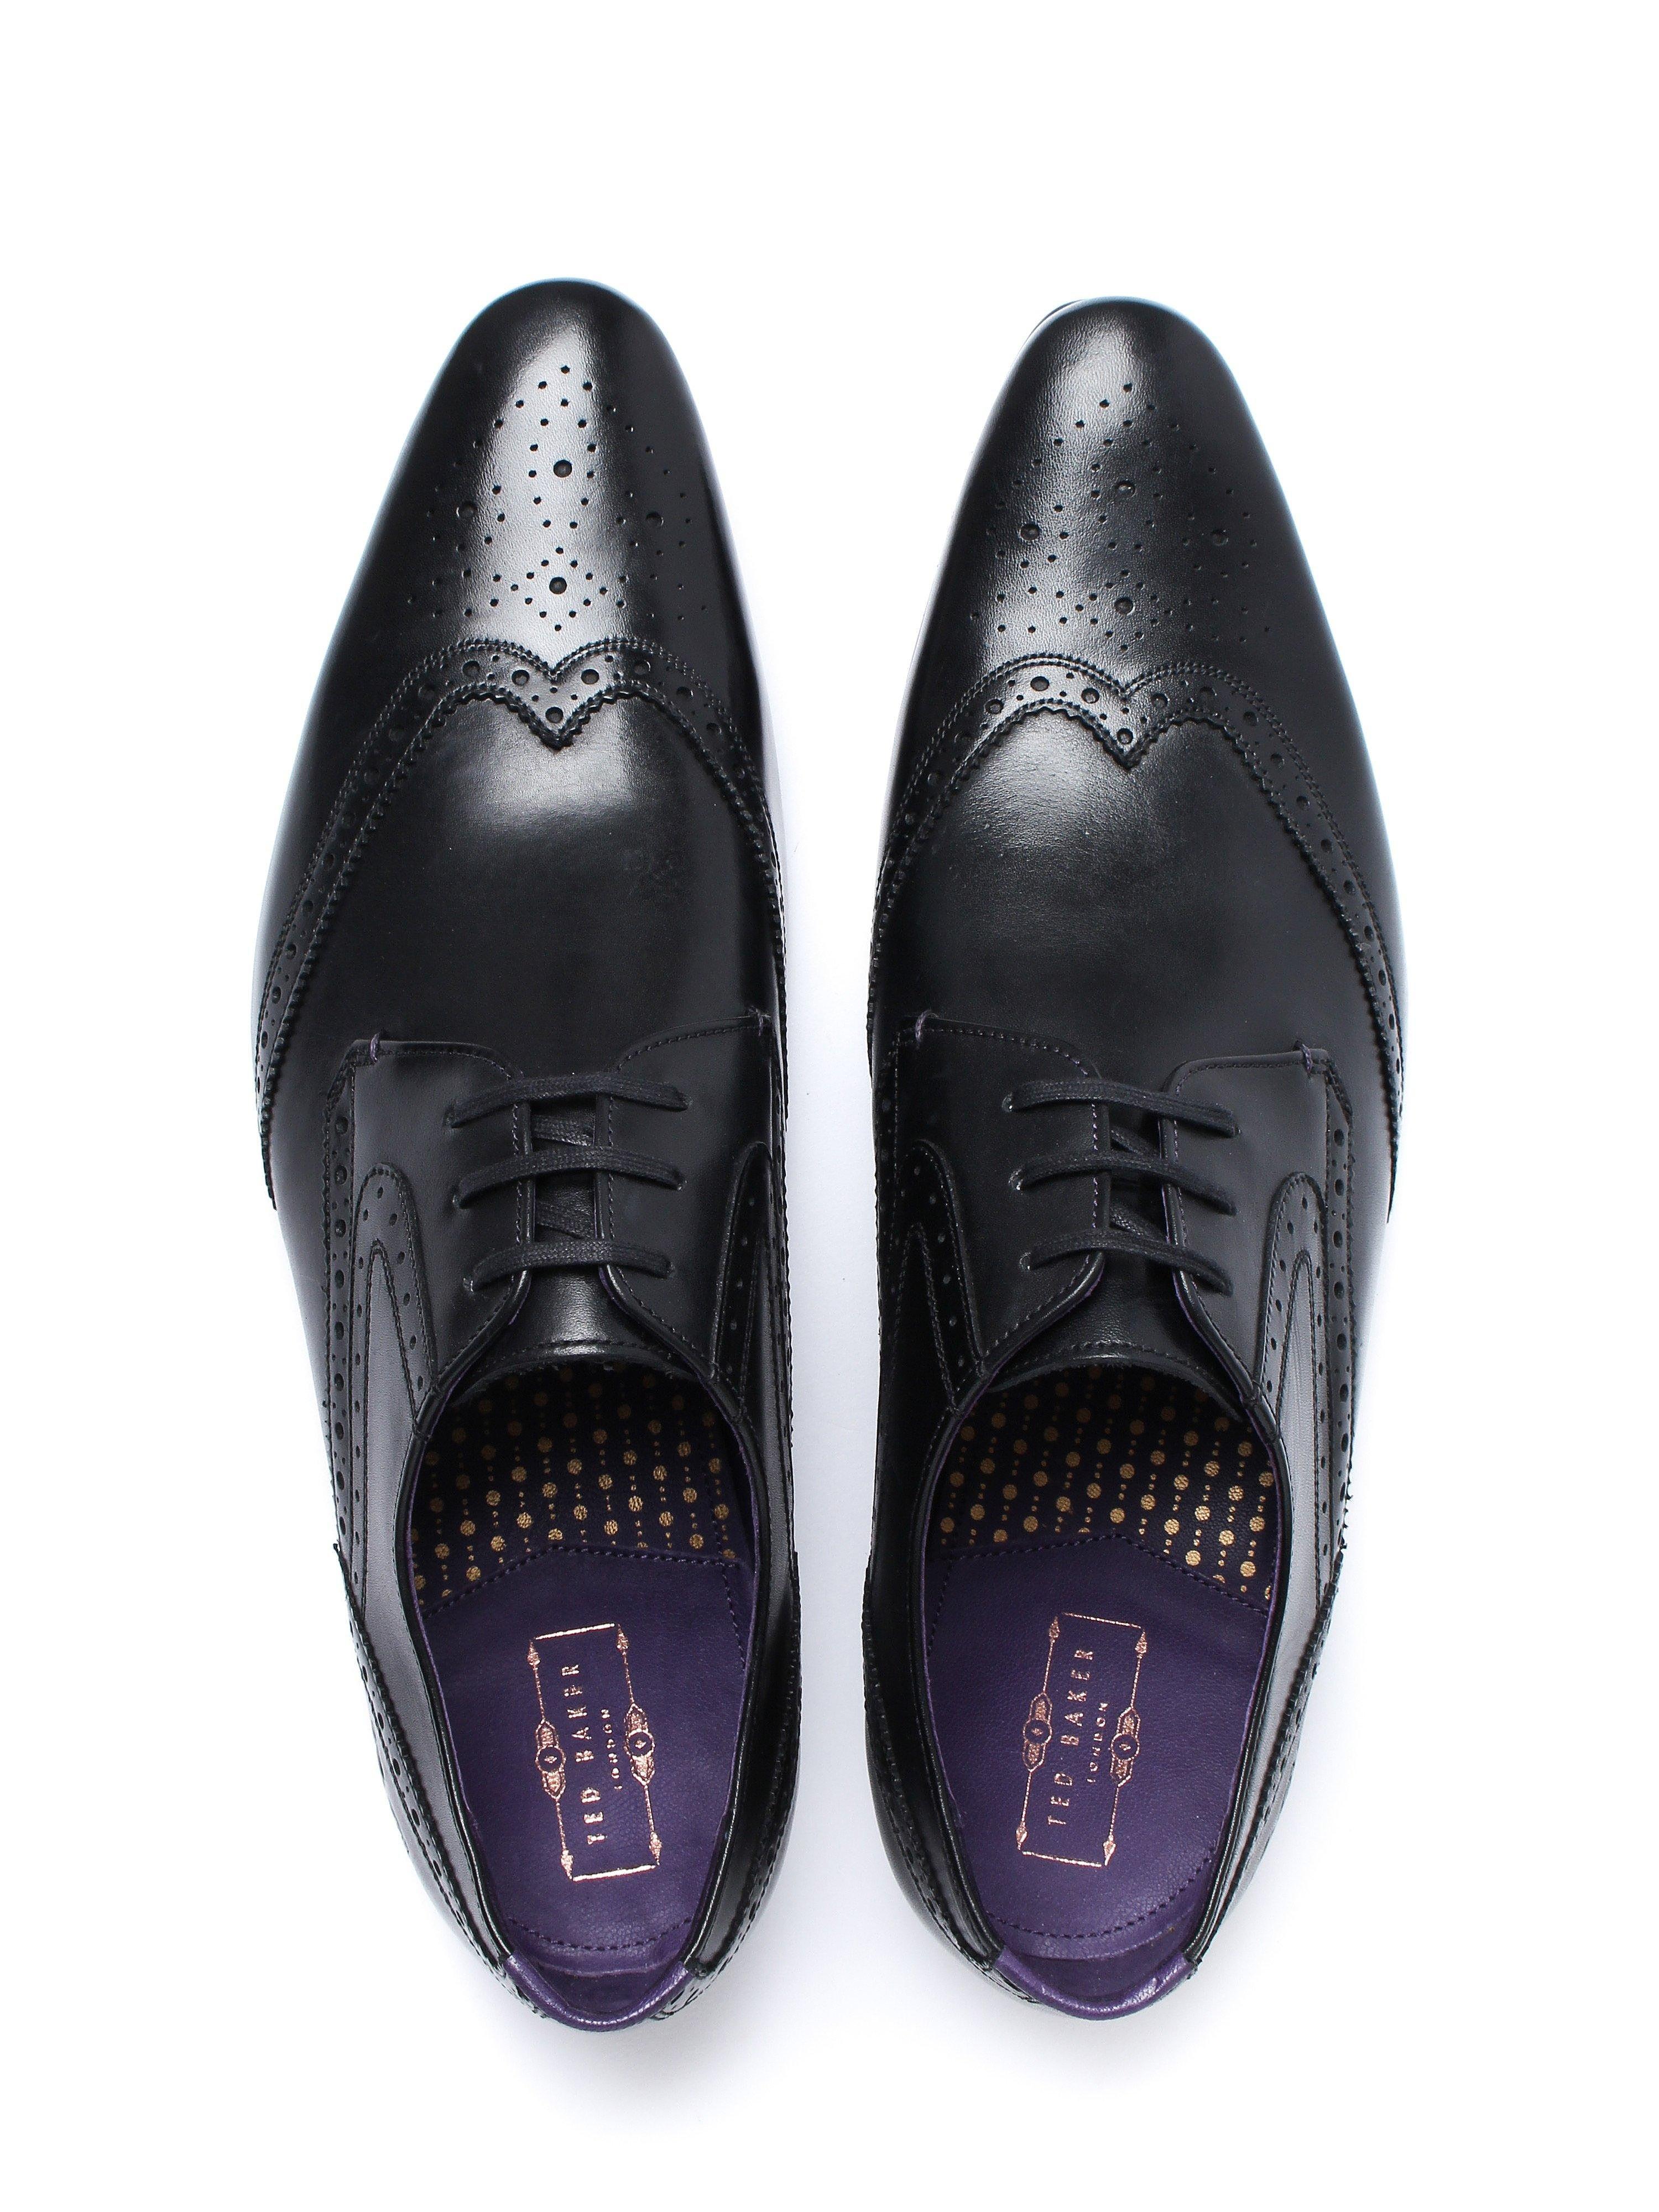 Ted Baker Men's Hann 2 Leather Derby Shoes - Black